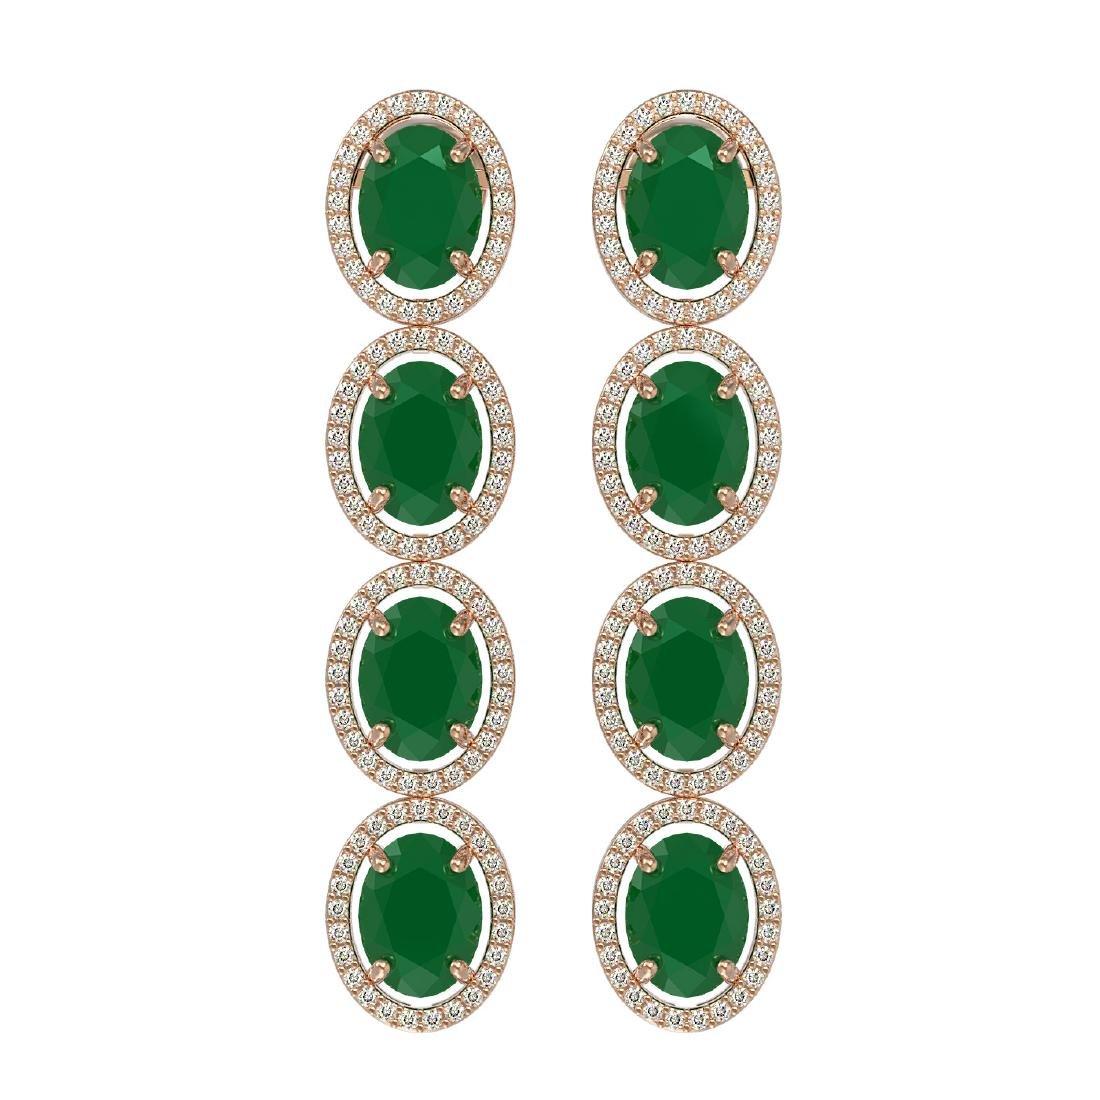 15.68 CTW Emerald & Diamond Halo Earrings 10K Rose Gold